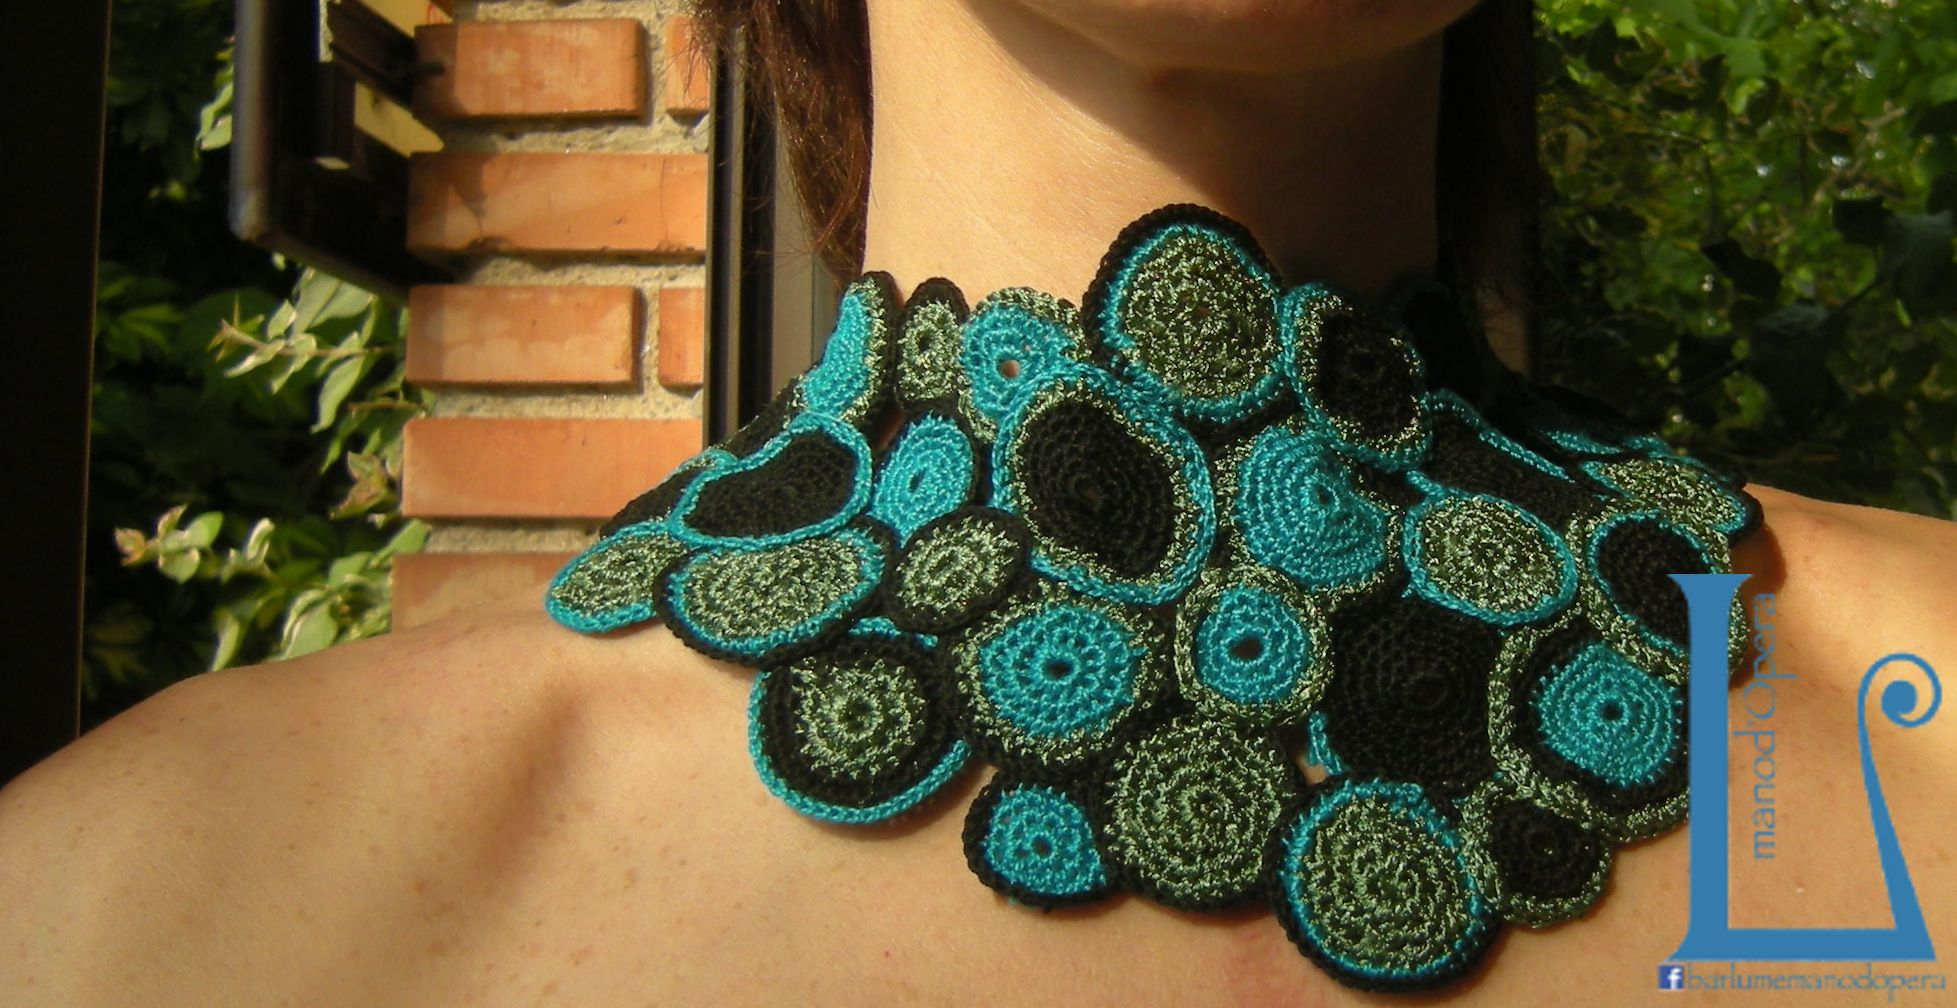 Bubbles necklace.Crochet.Cotton. Handmade by Barlume Manod'opera.